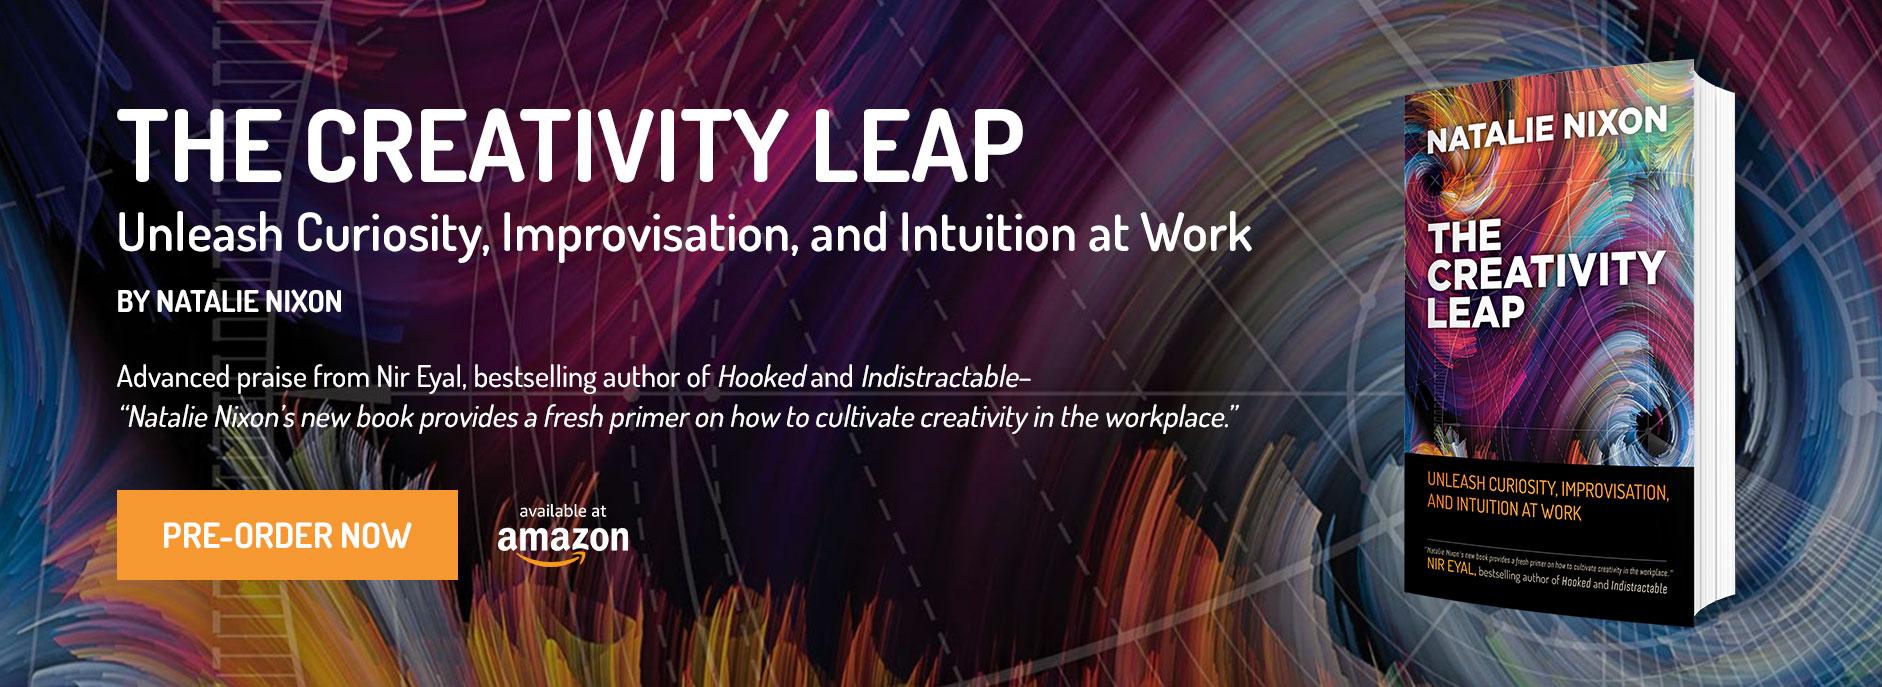 the creativity leap hero